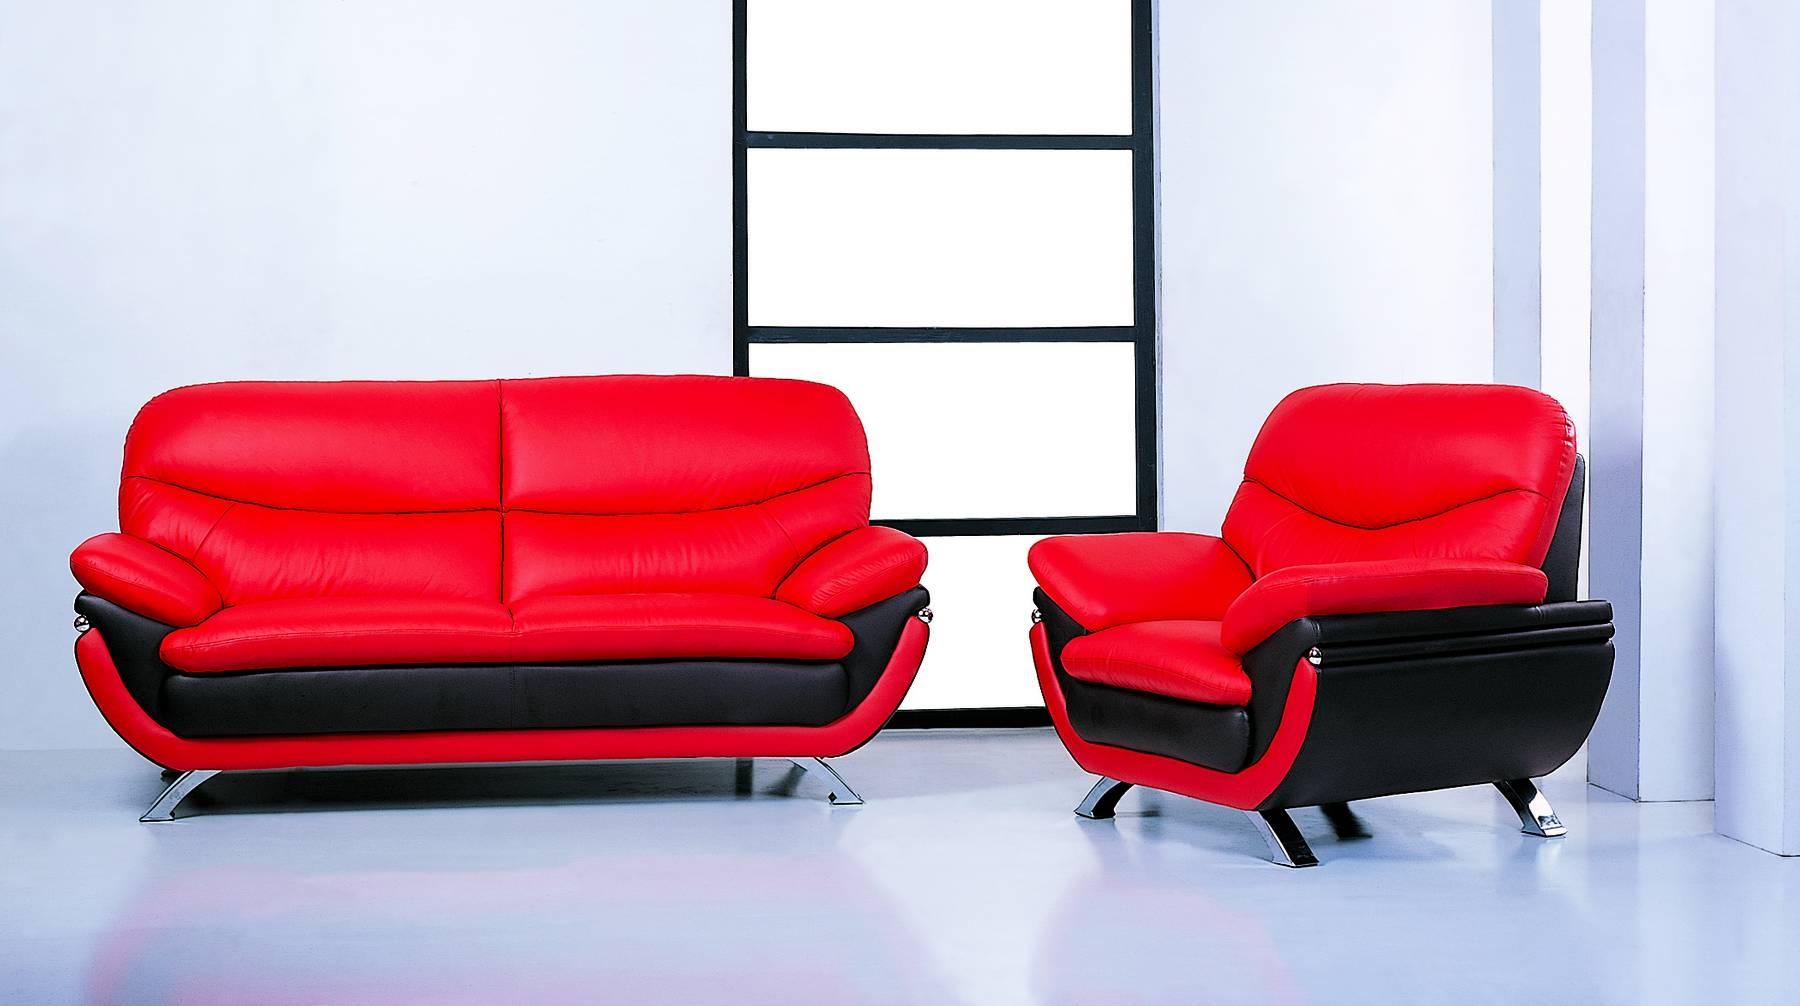 Jonus Red/black Sofa Jonus Beverly Hills Furniture Leather Sofas Pertaining To Black And Red Sofa Sets (View 2 of 15)